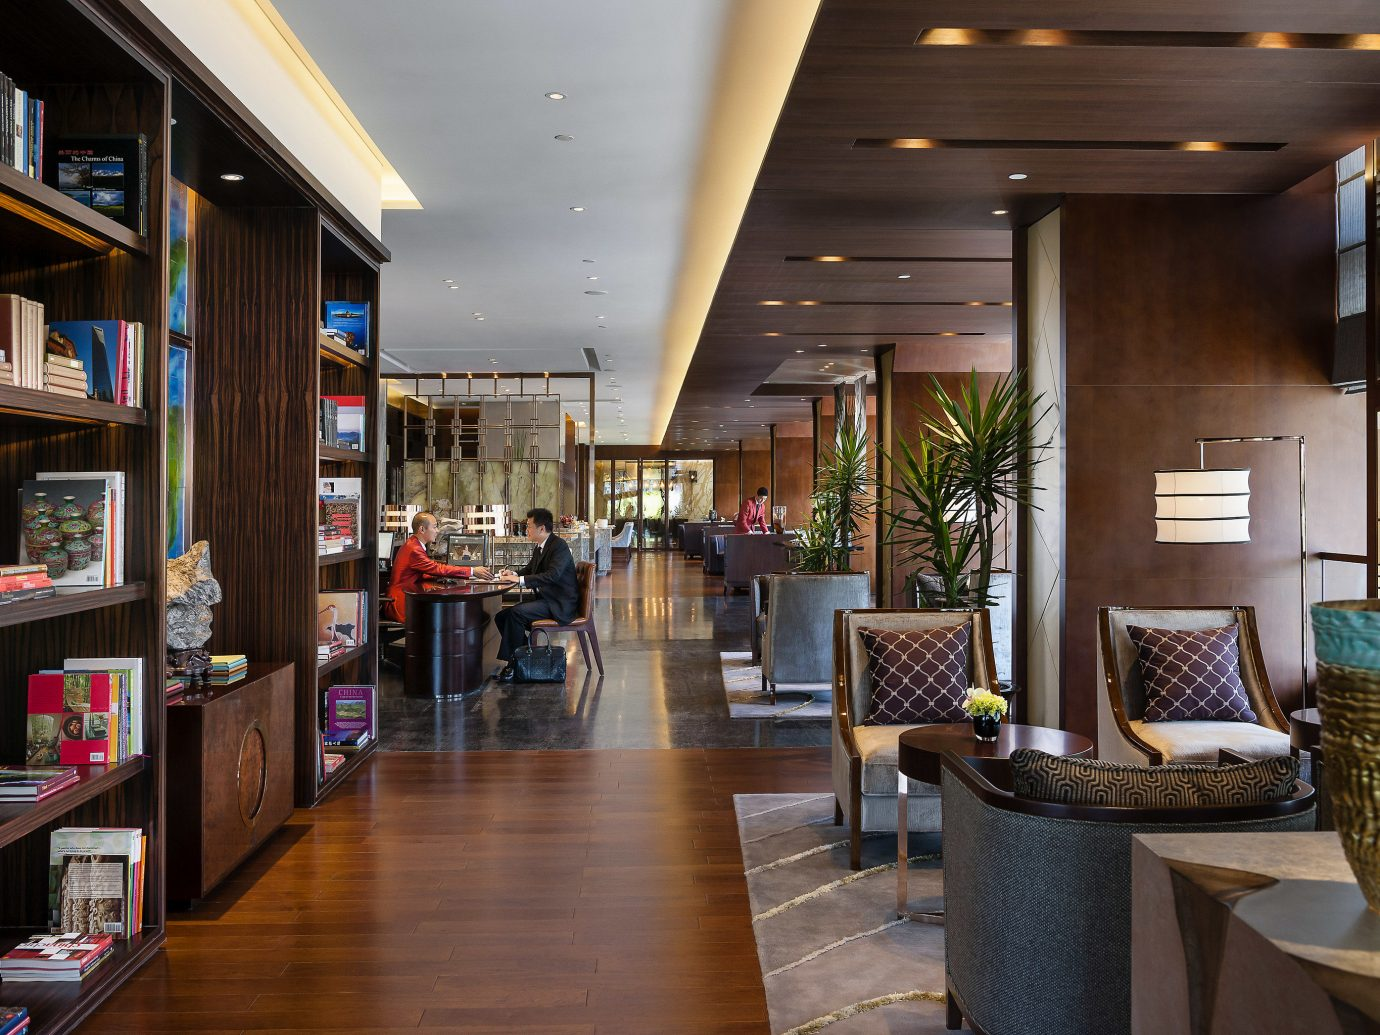 Boutique Hotels Luxury Travel indoor floor shelf ceiling room interior design Lobby café restaurant several